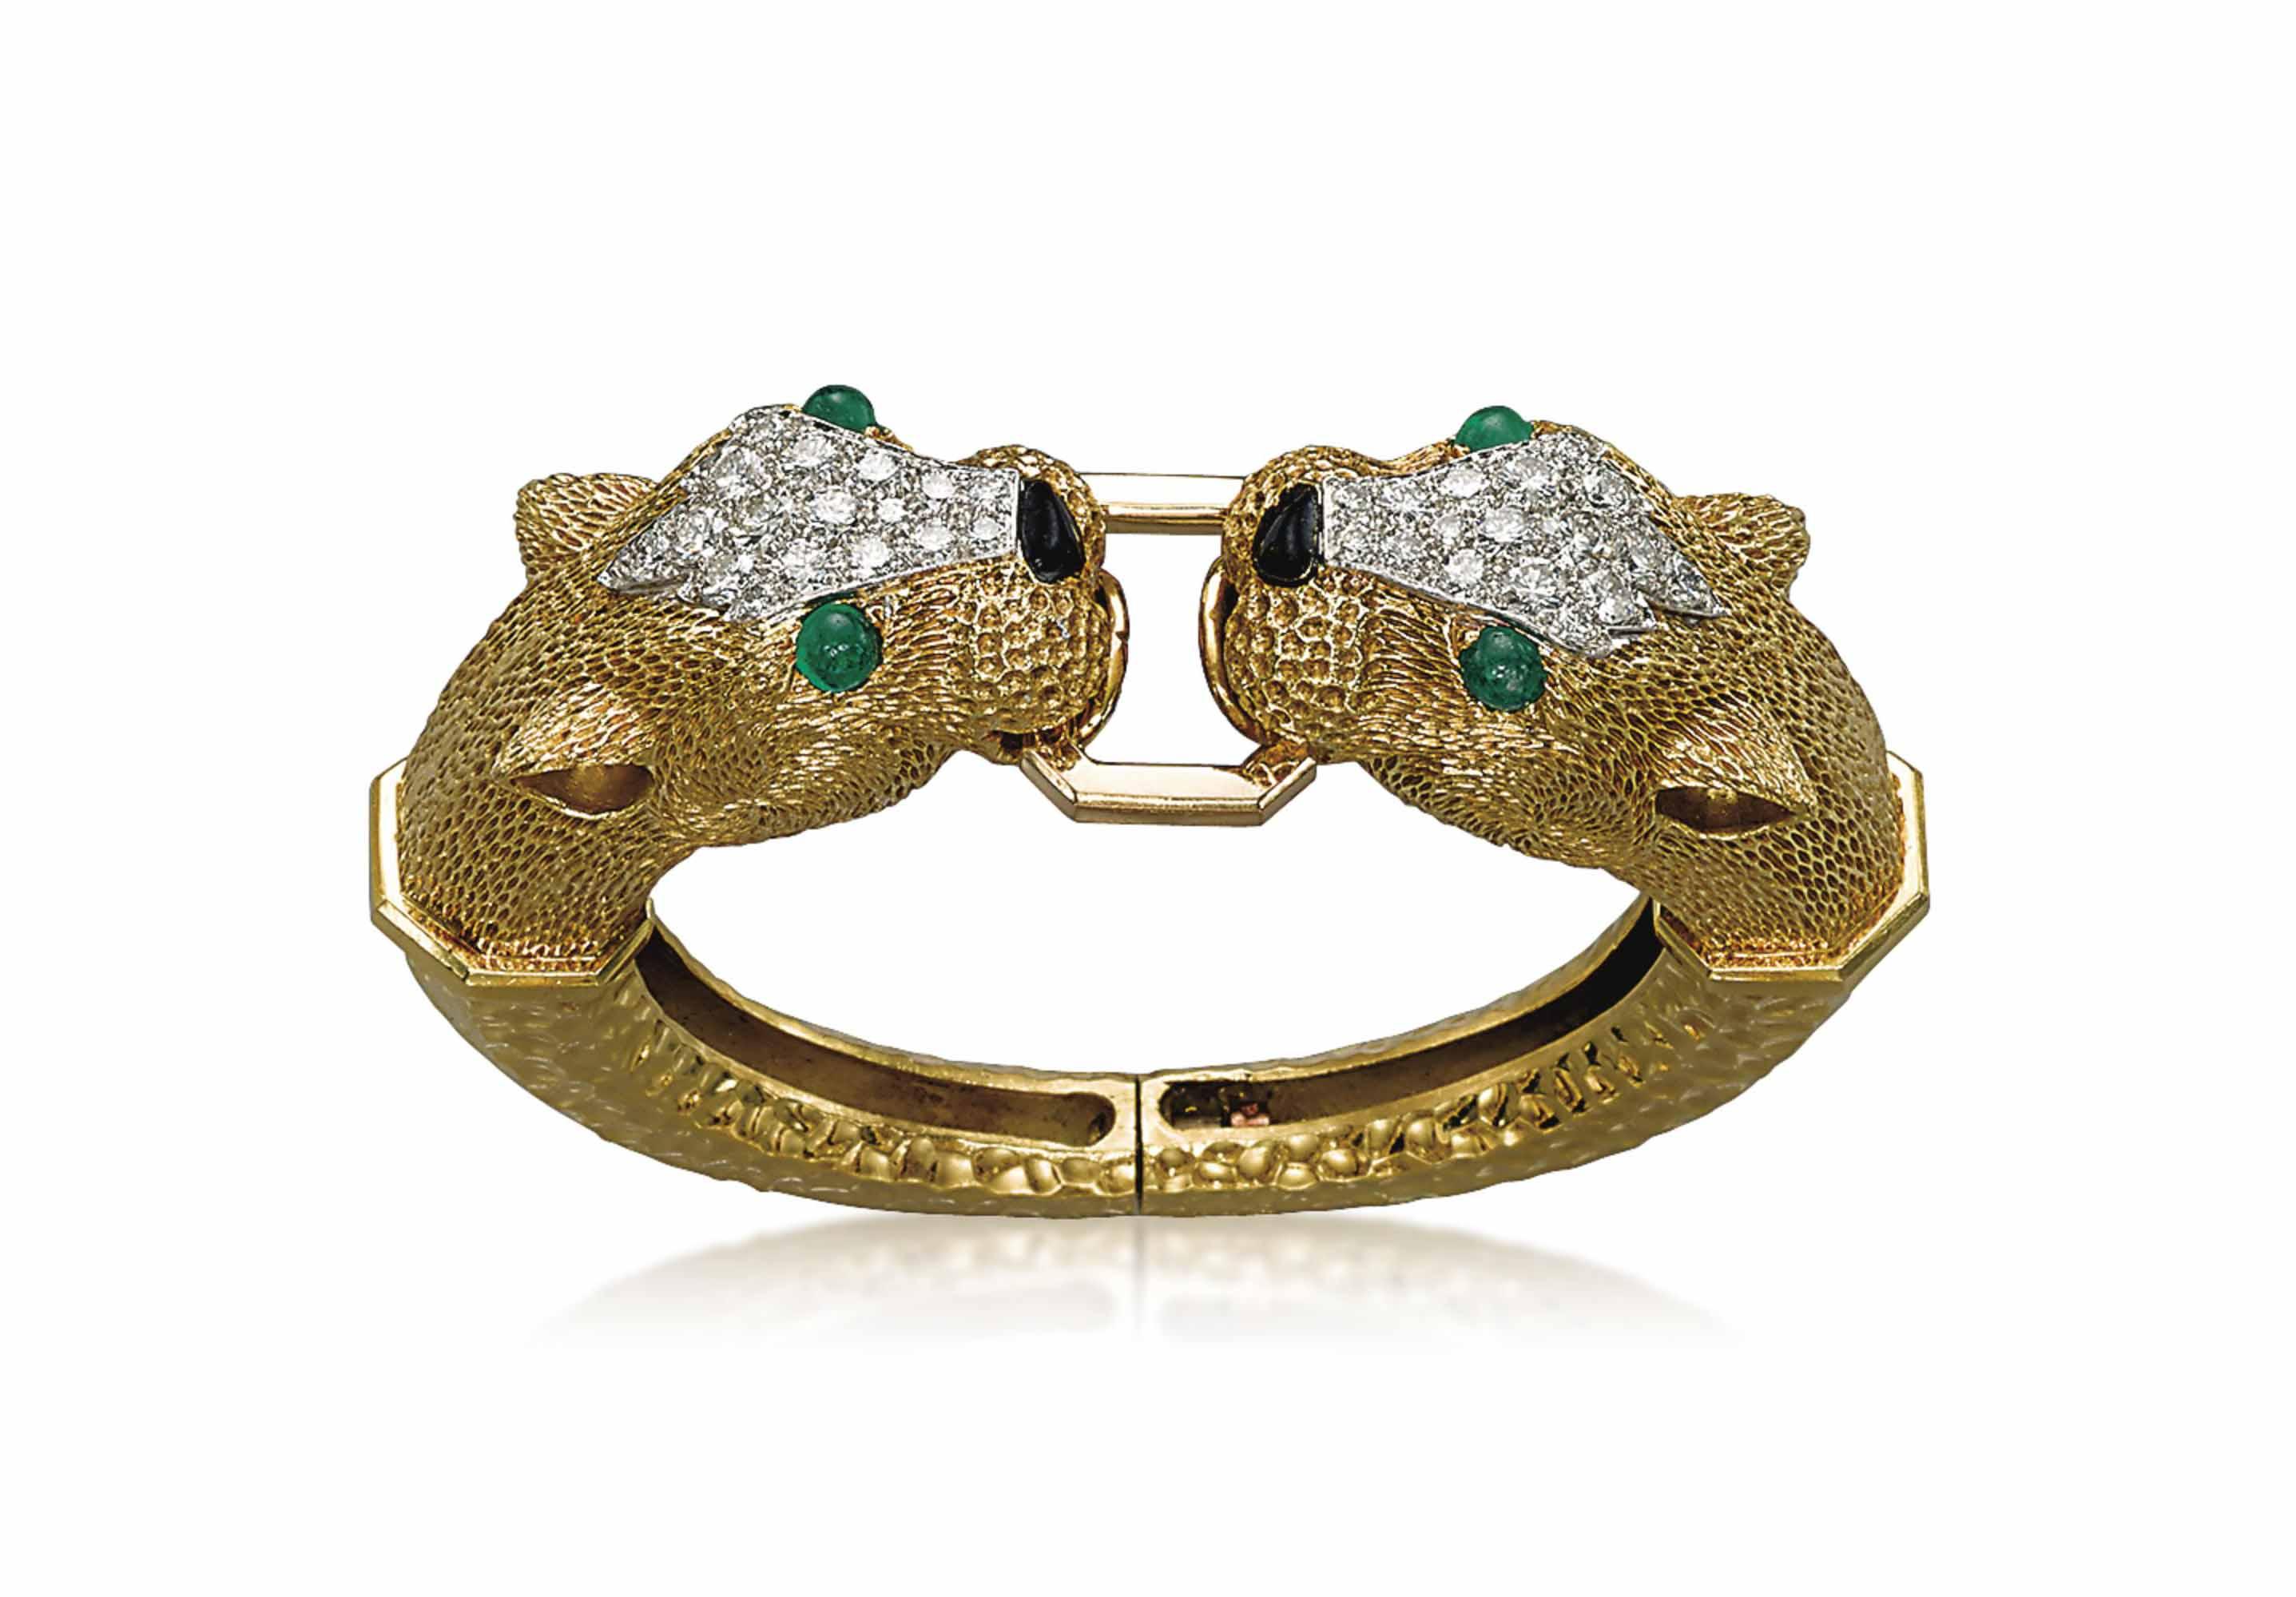 A GOLD, DIAMOND AND EMERALD BA